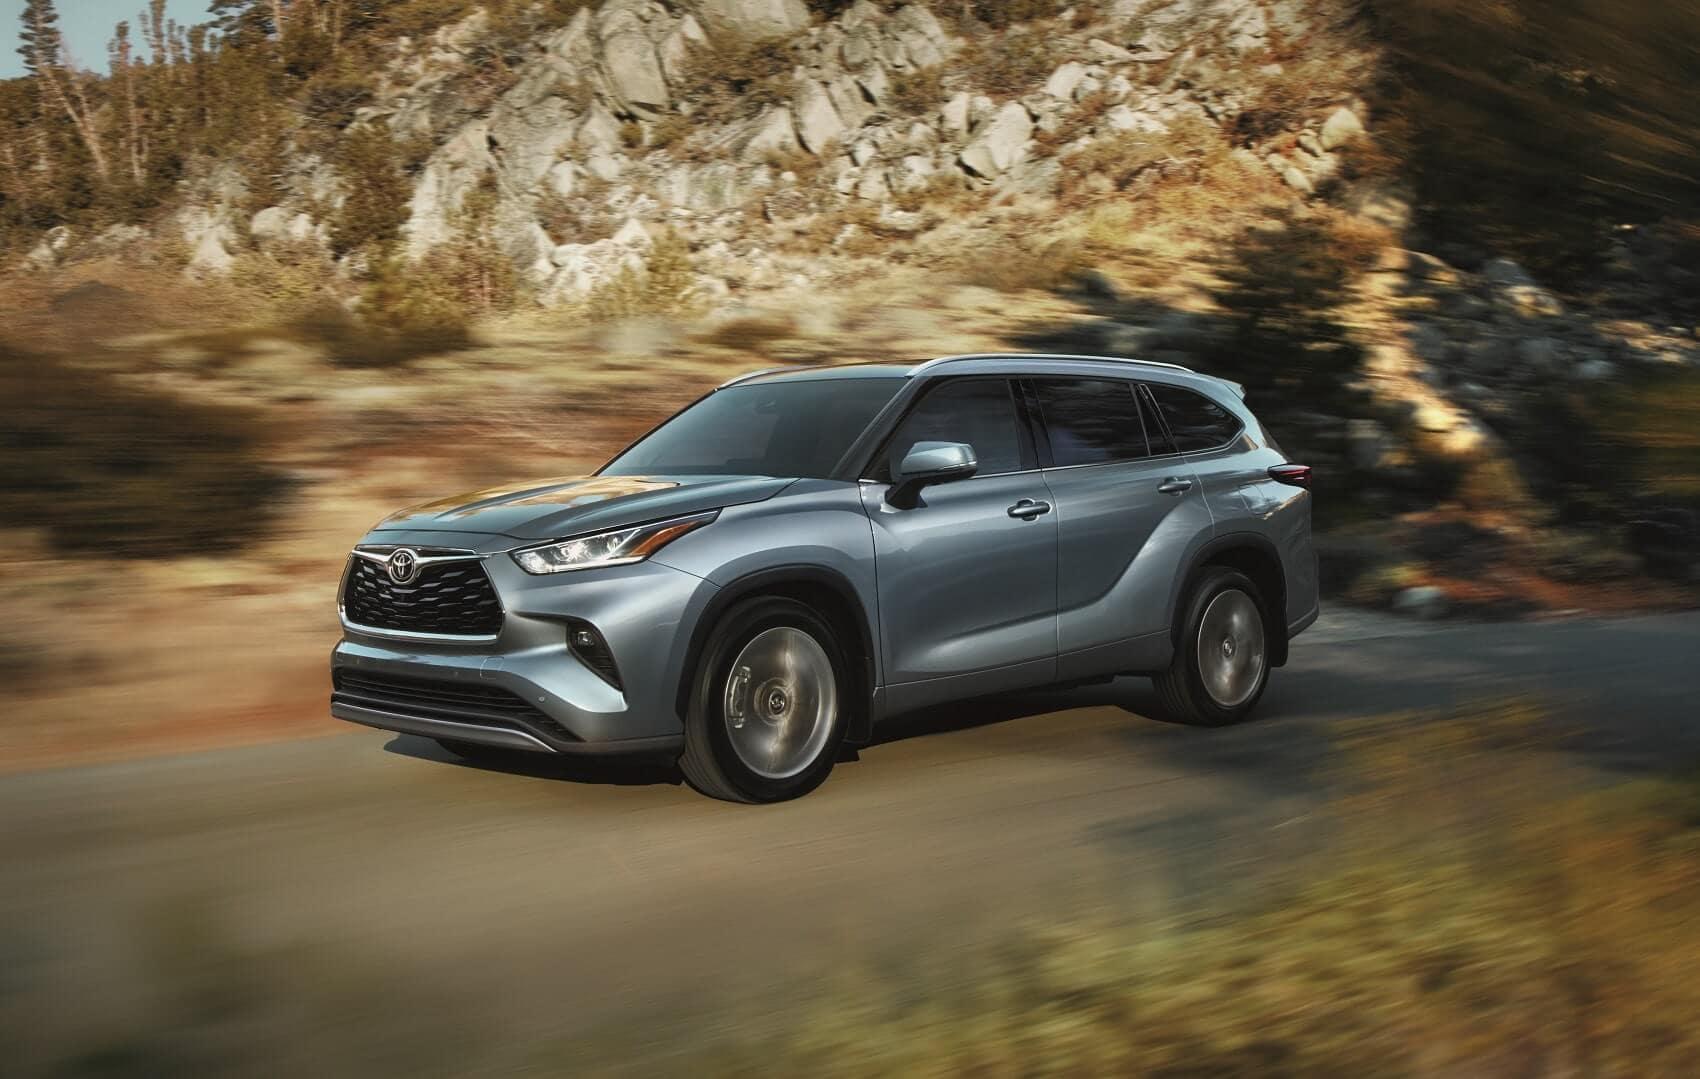 2020 Toyota Highlander Driving